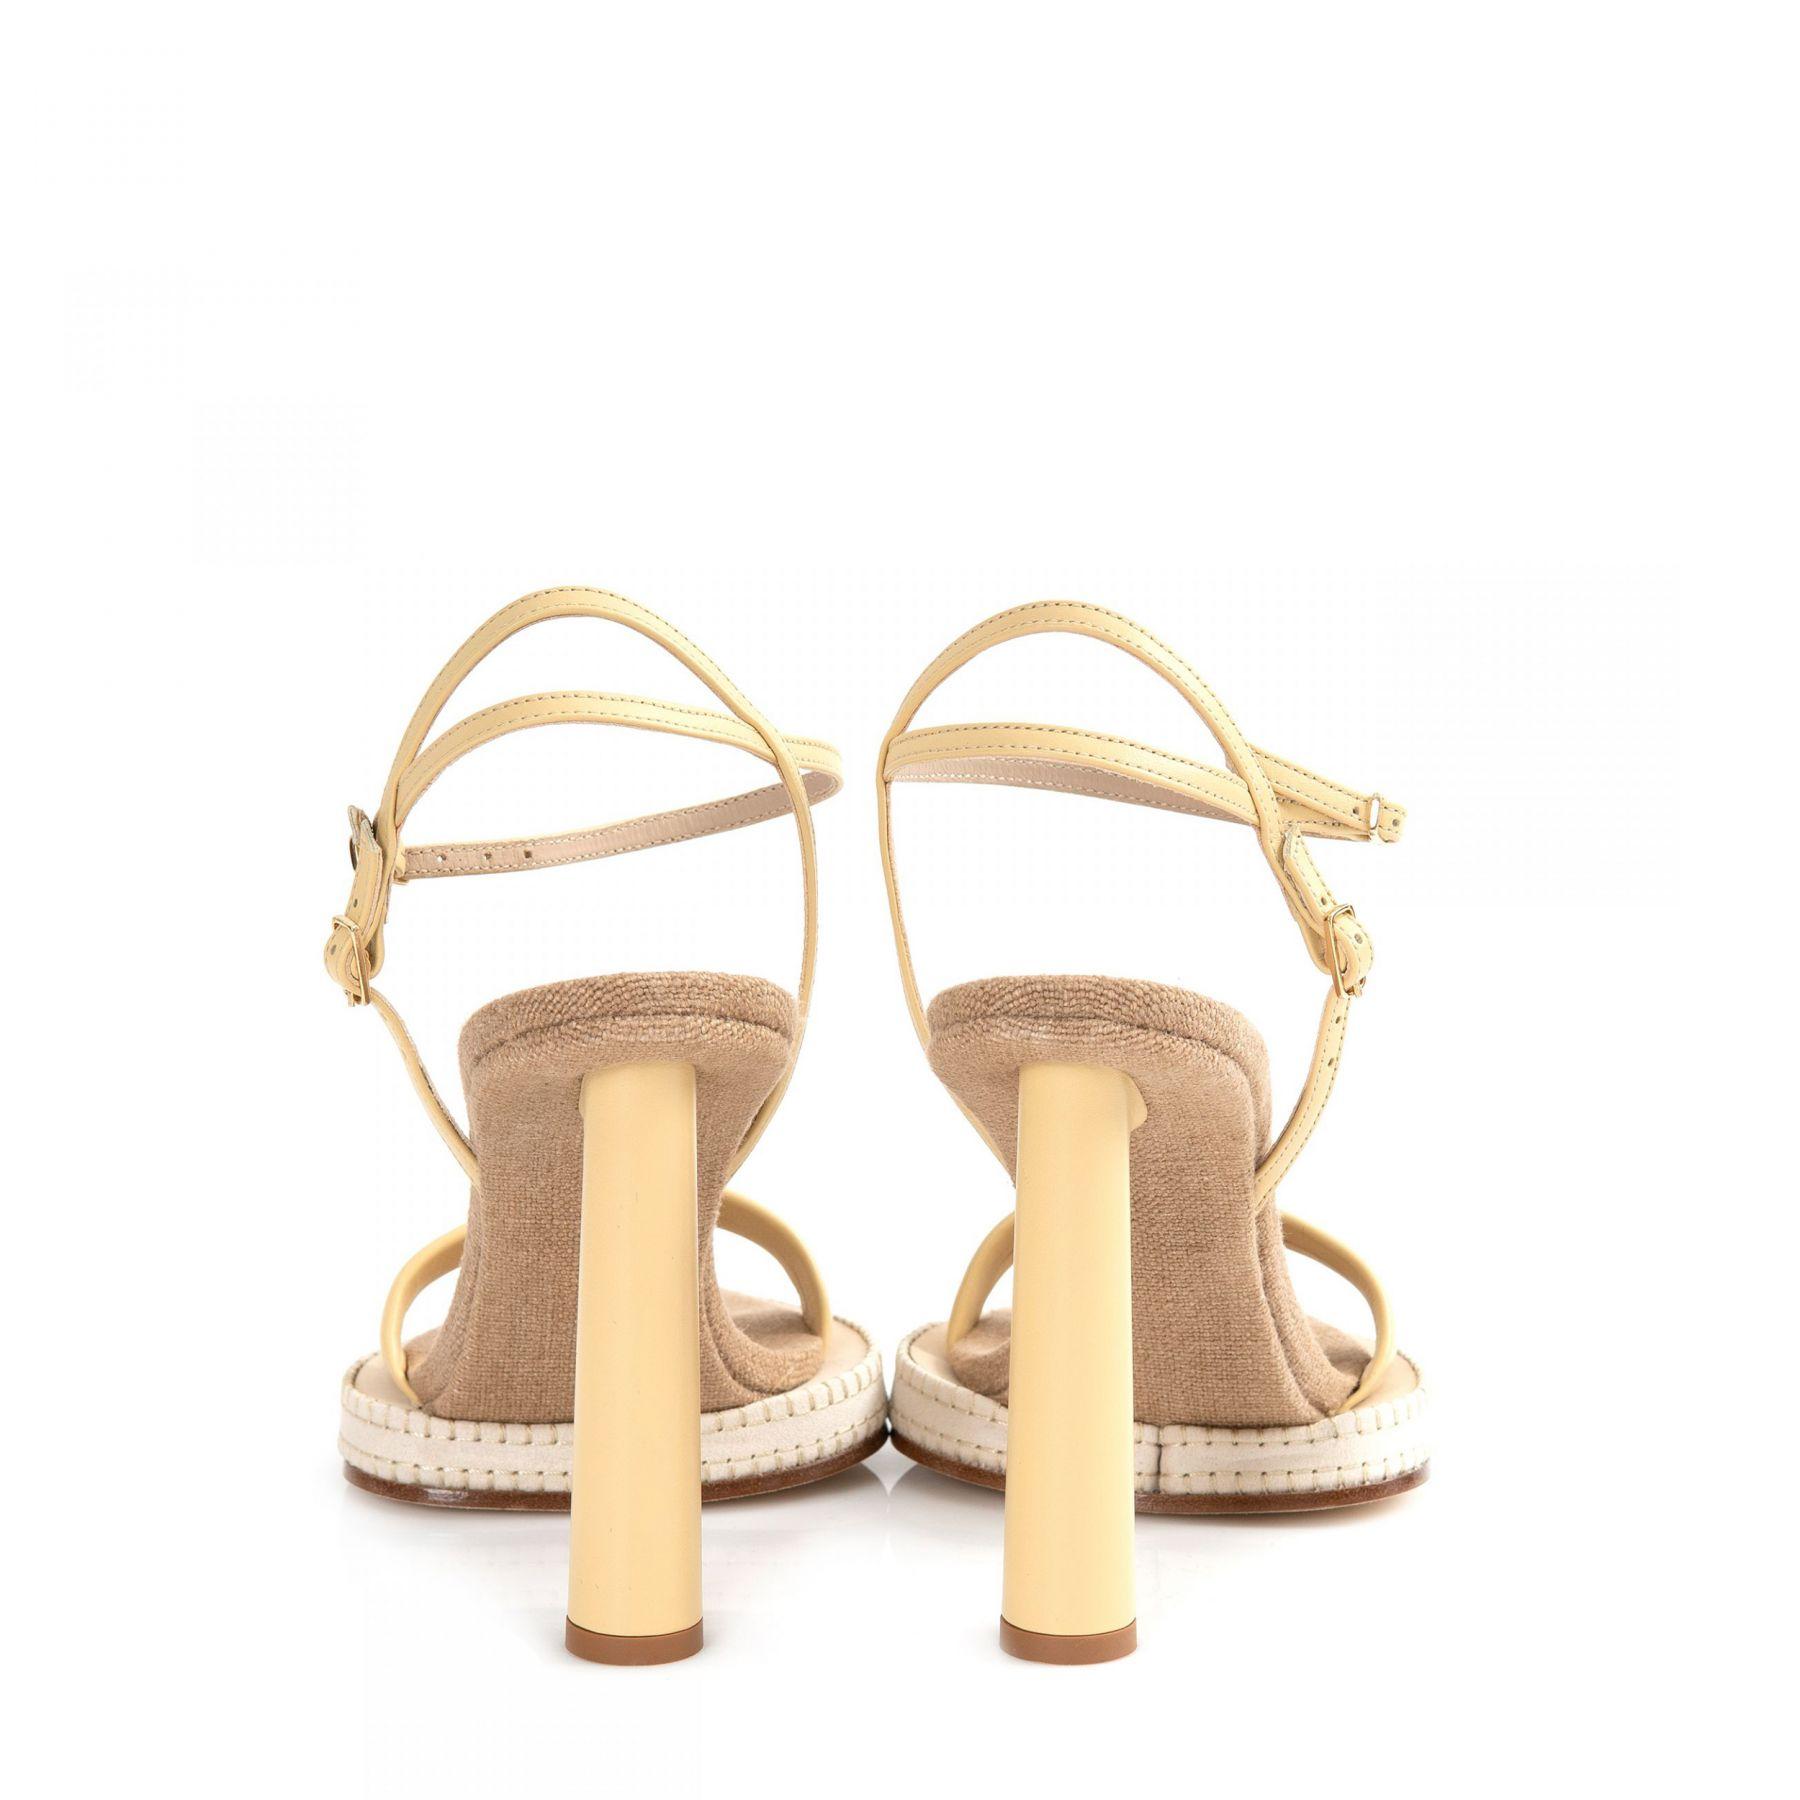 Босоножки Jacquemus Les sandales Novio бежевые